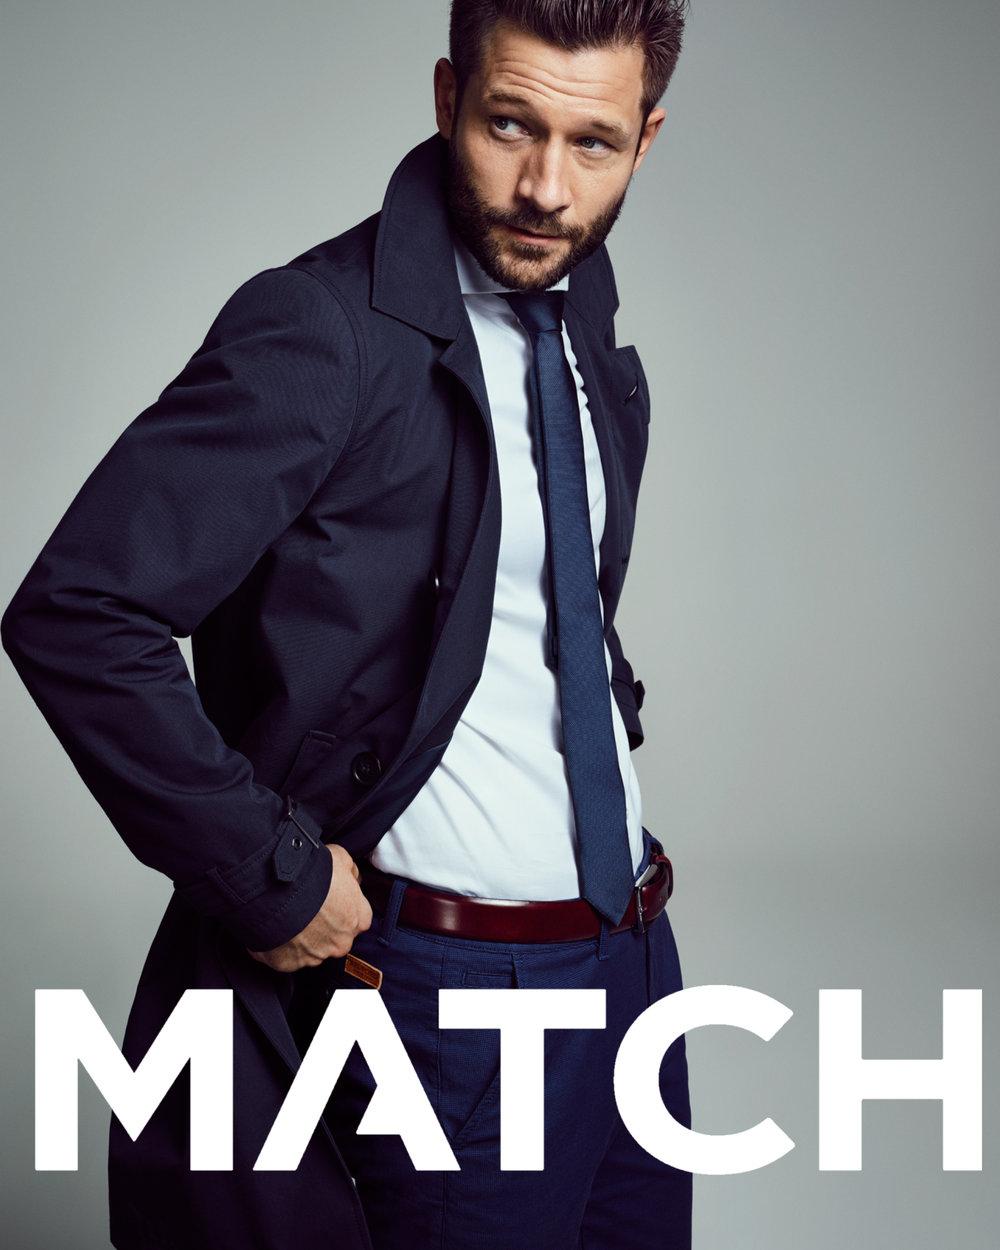 match7.jpg